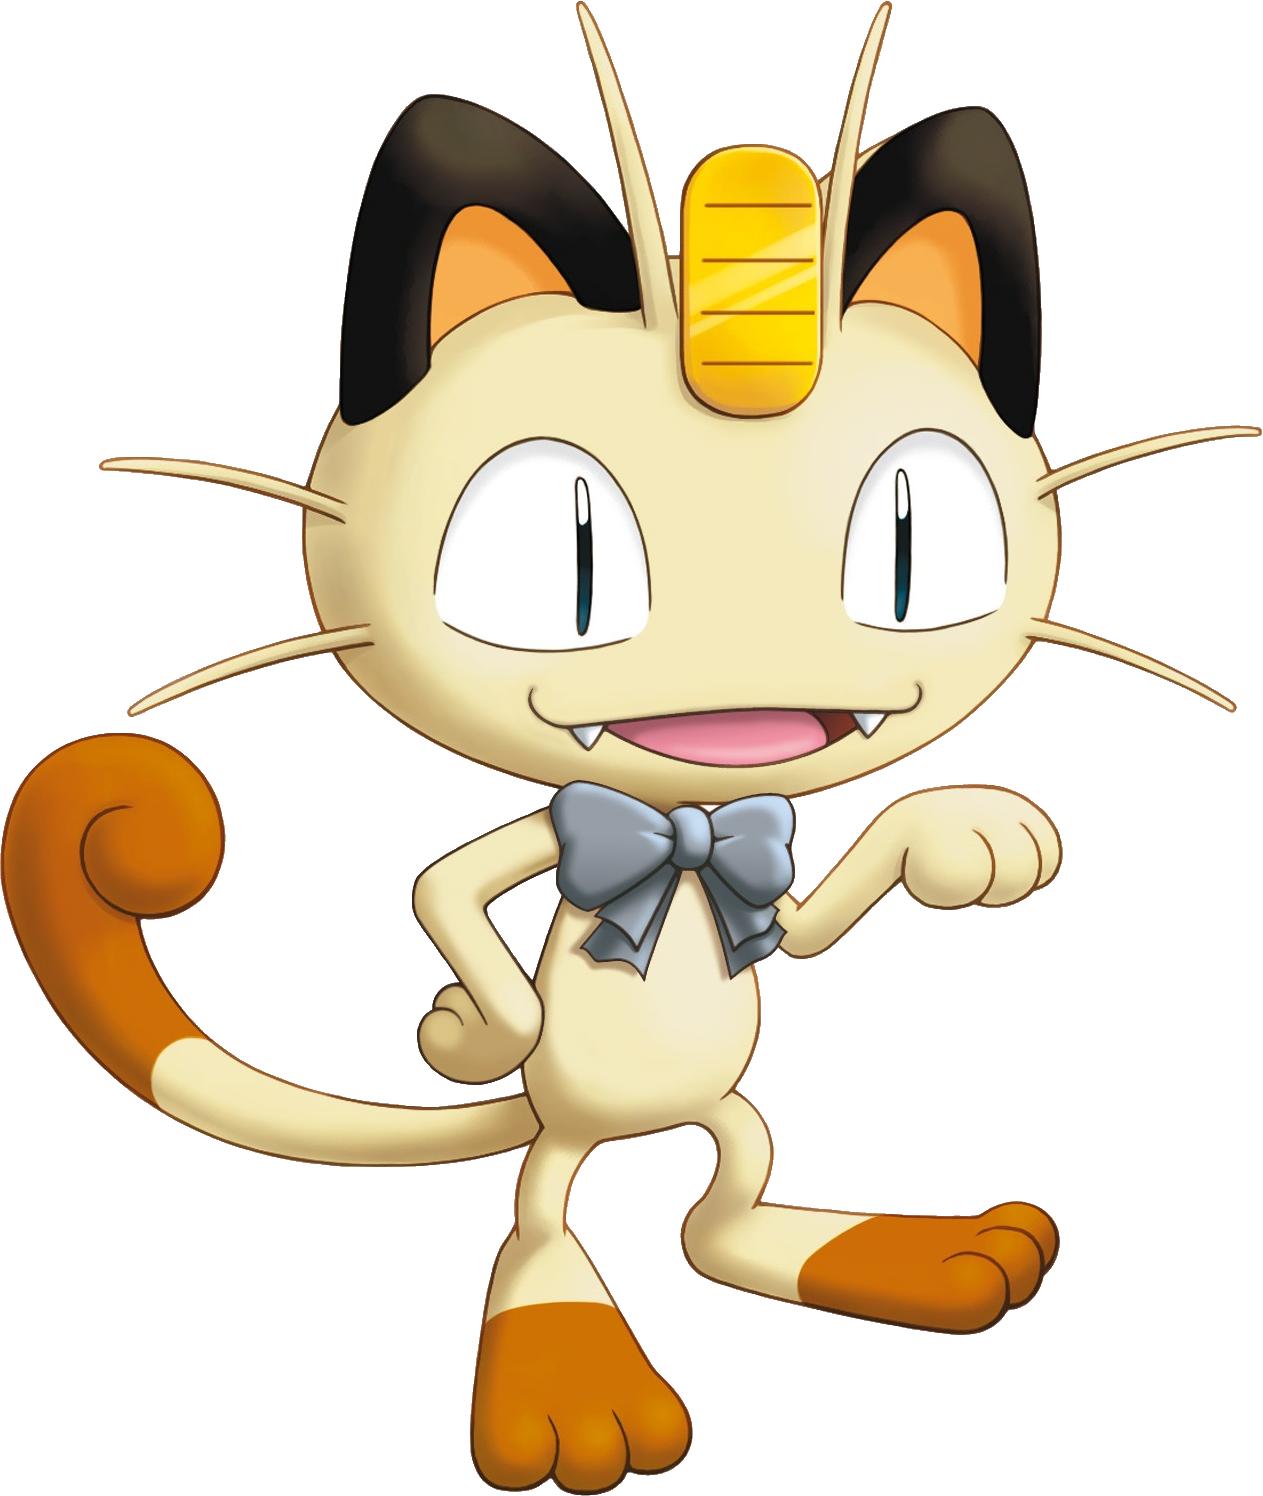 Image meowth pokemon mystery. Explorer clipart geo